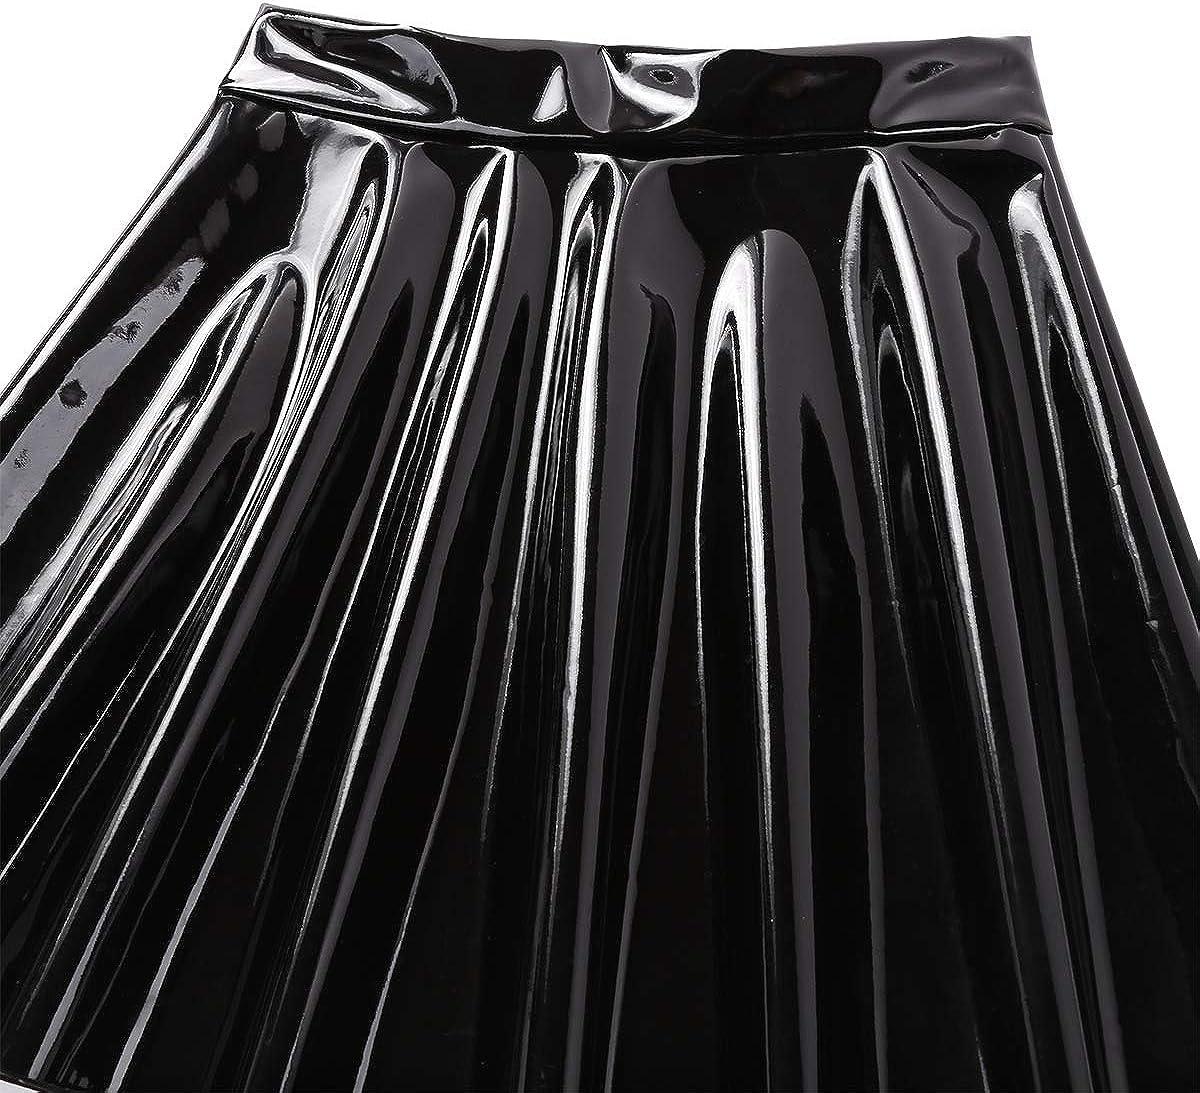 easyforever Women's Wet Look PU Leather High Waist Flared Pleated A-Line Circle Mini Skater Skirt Clubwear